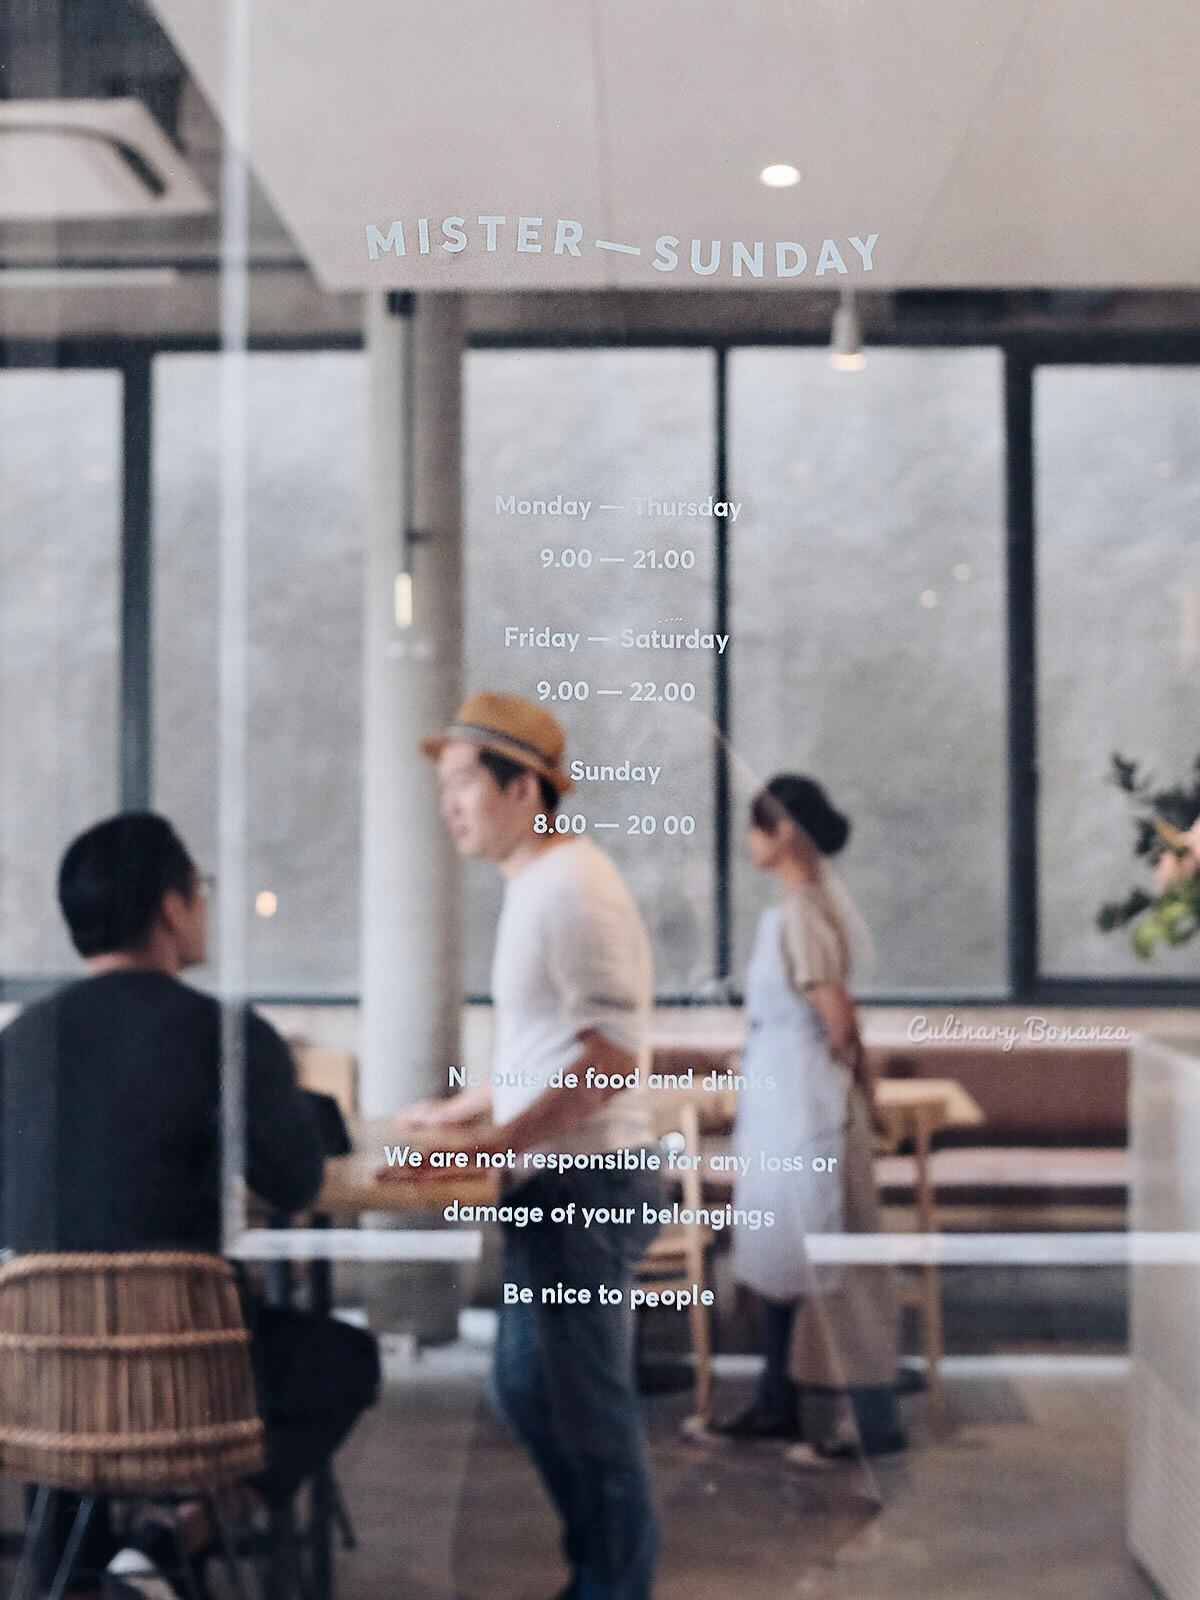 Mister-Sunday-(www.culinarybonanza.com)